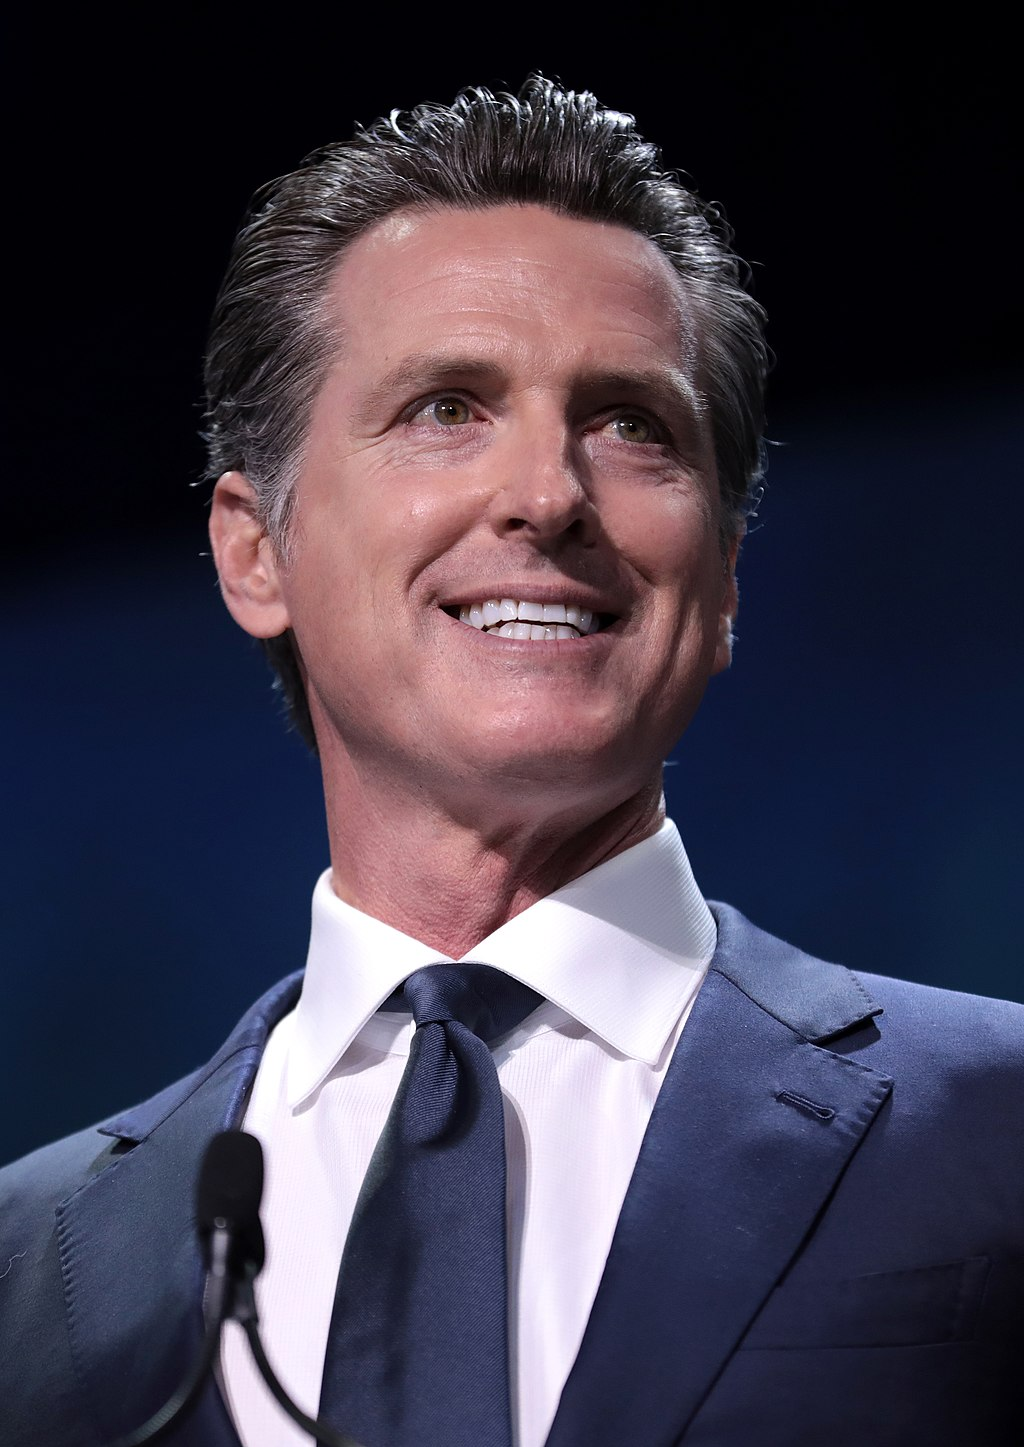 Gavin Newsom, California State Governor